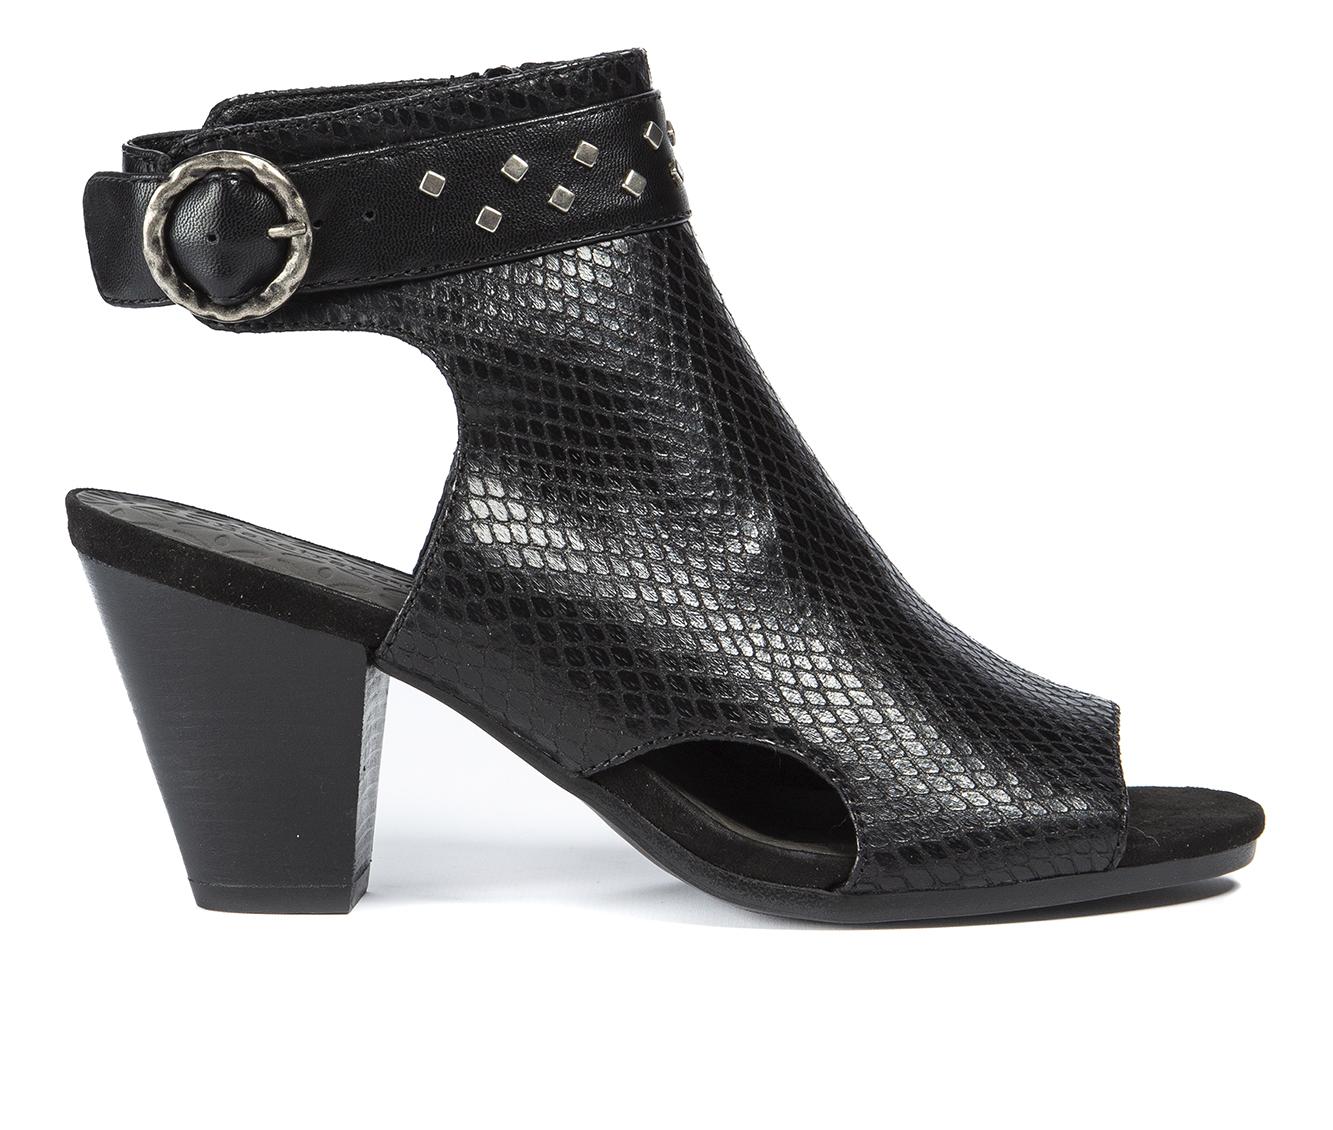 Baretraps Reining Women's Dress Shoe (Black Faux Leather)